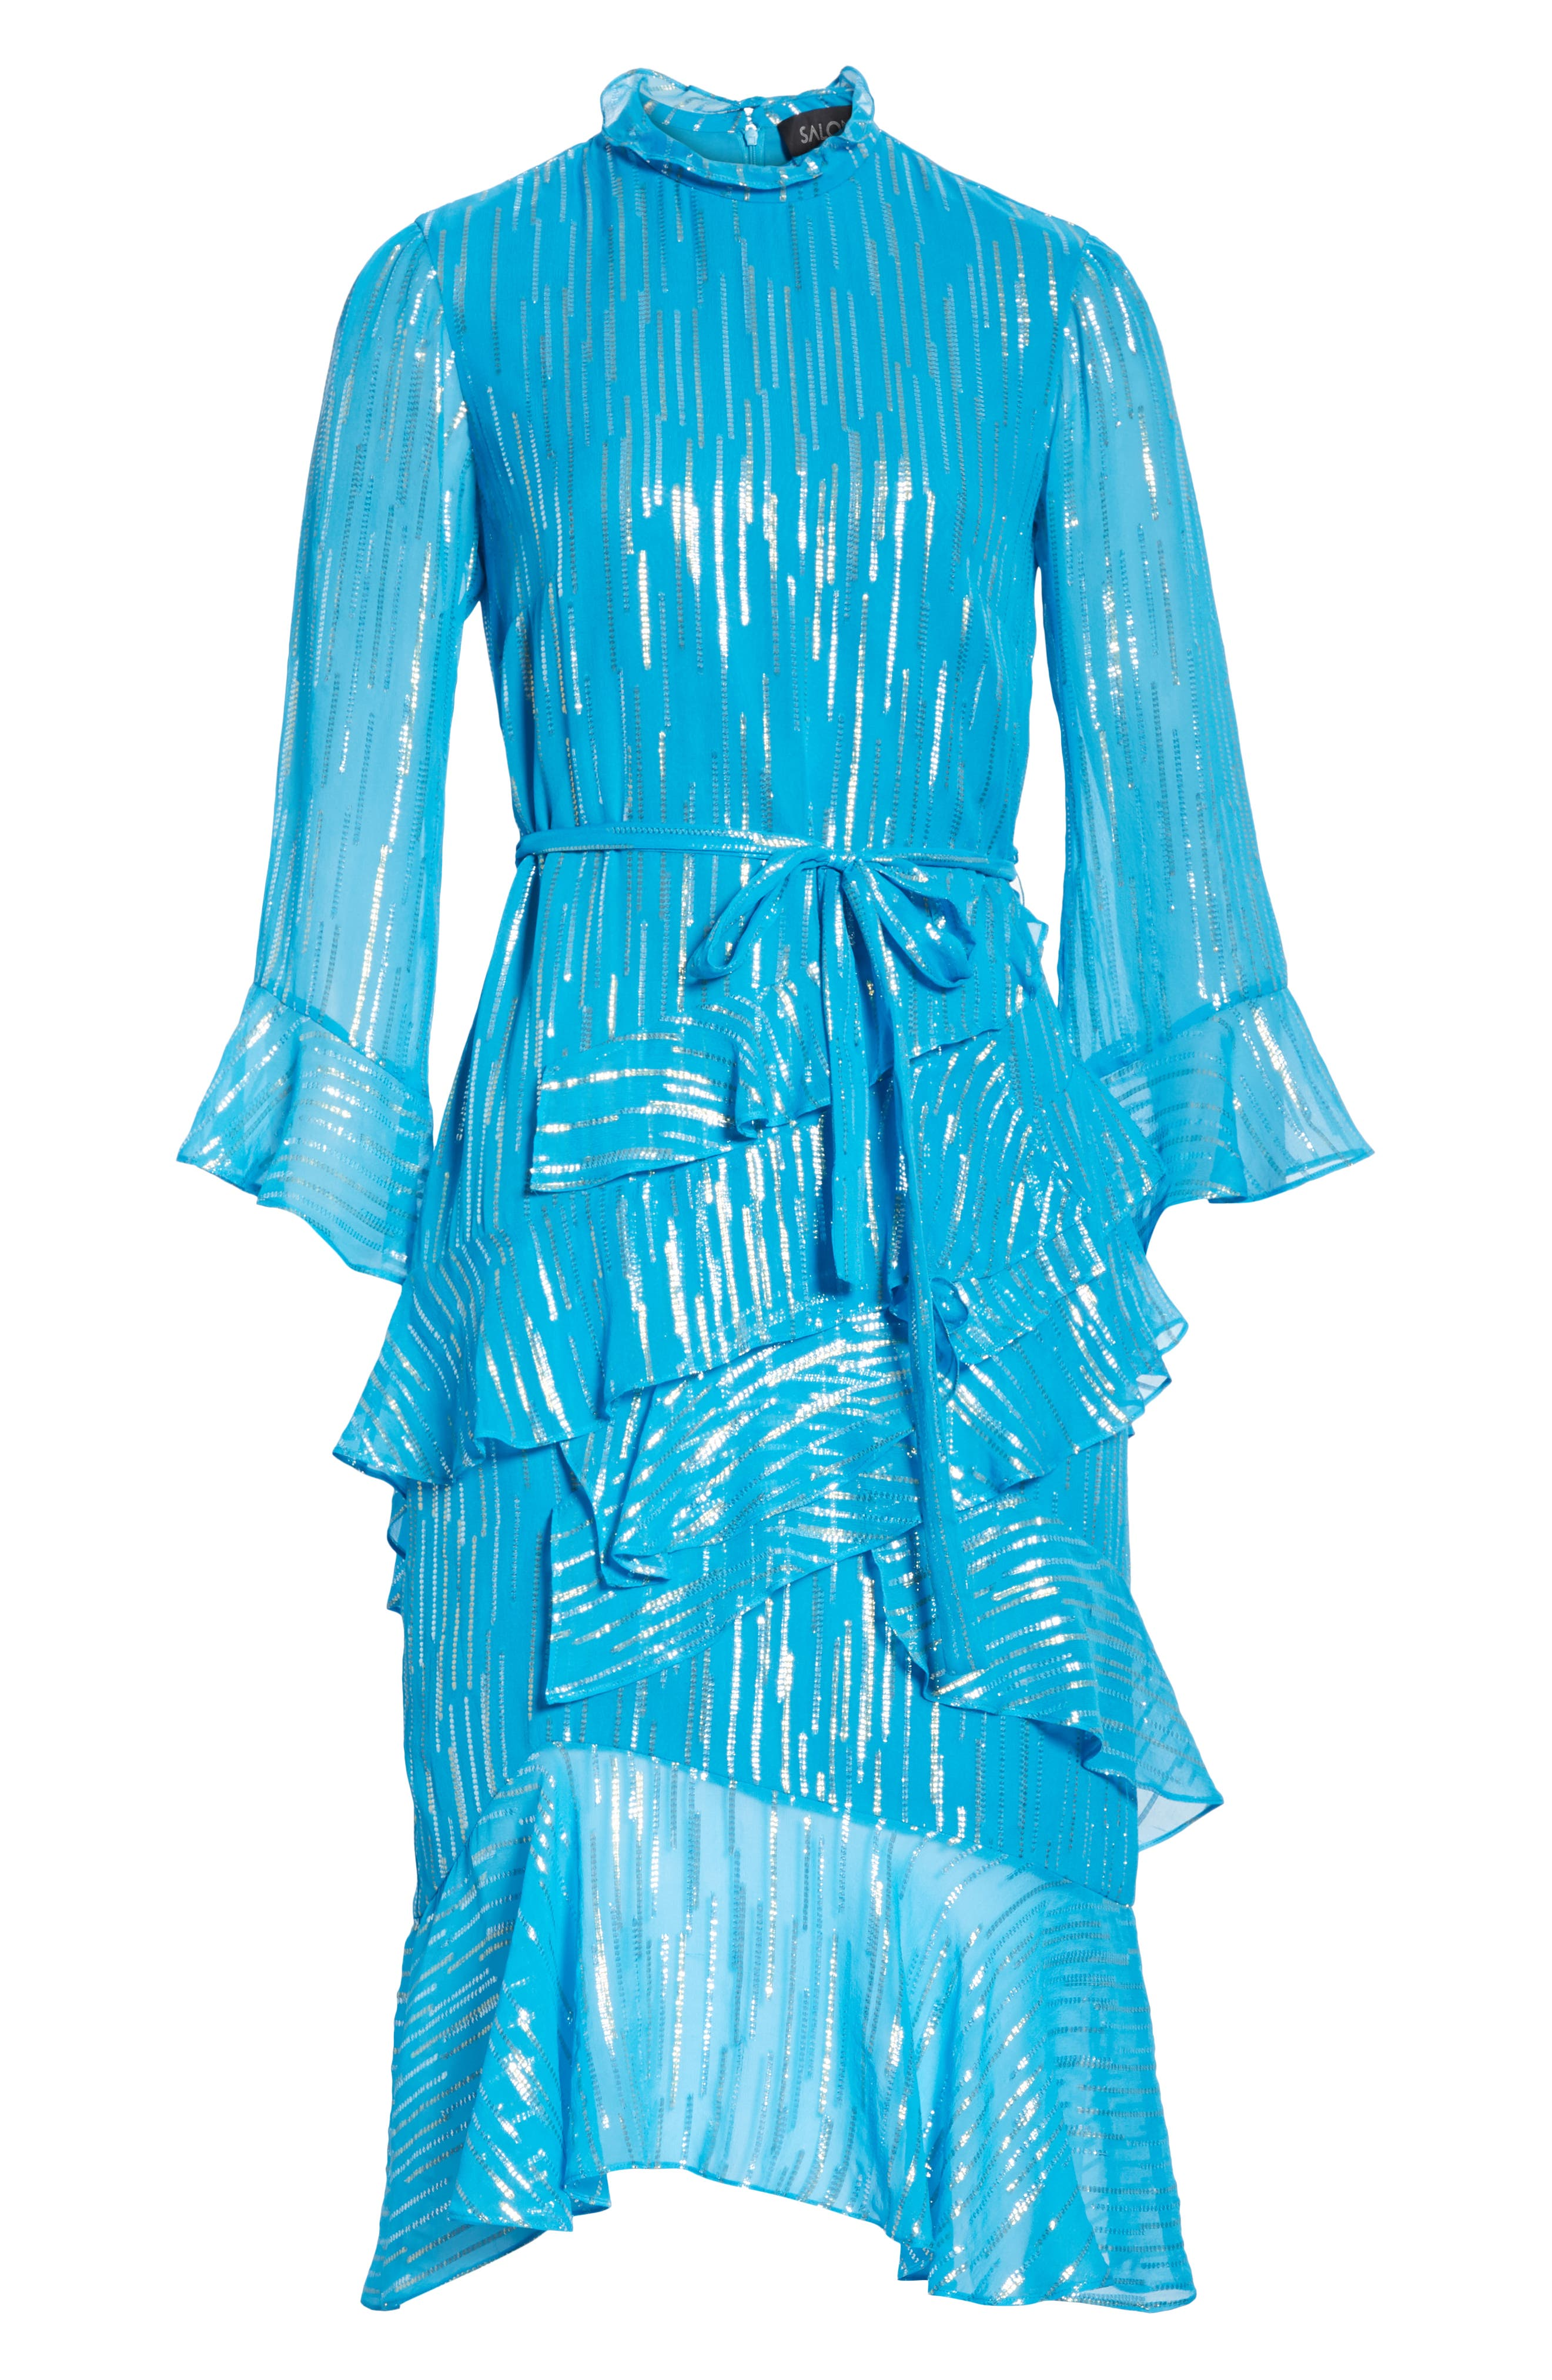 SALONI, Marissa Metallic Ruffle Dress, Alternate thumbnail 7, color, TURQUOISE/ METALLIC